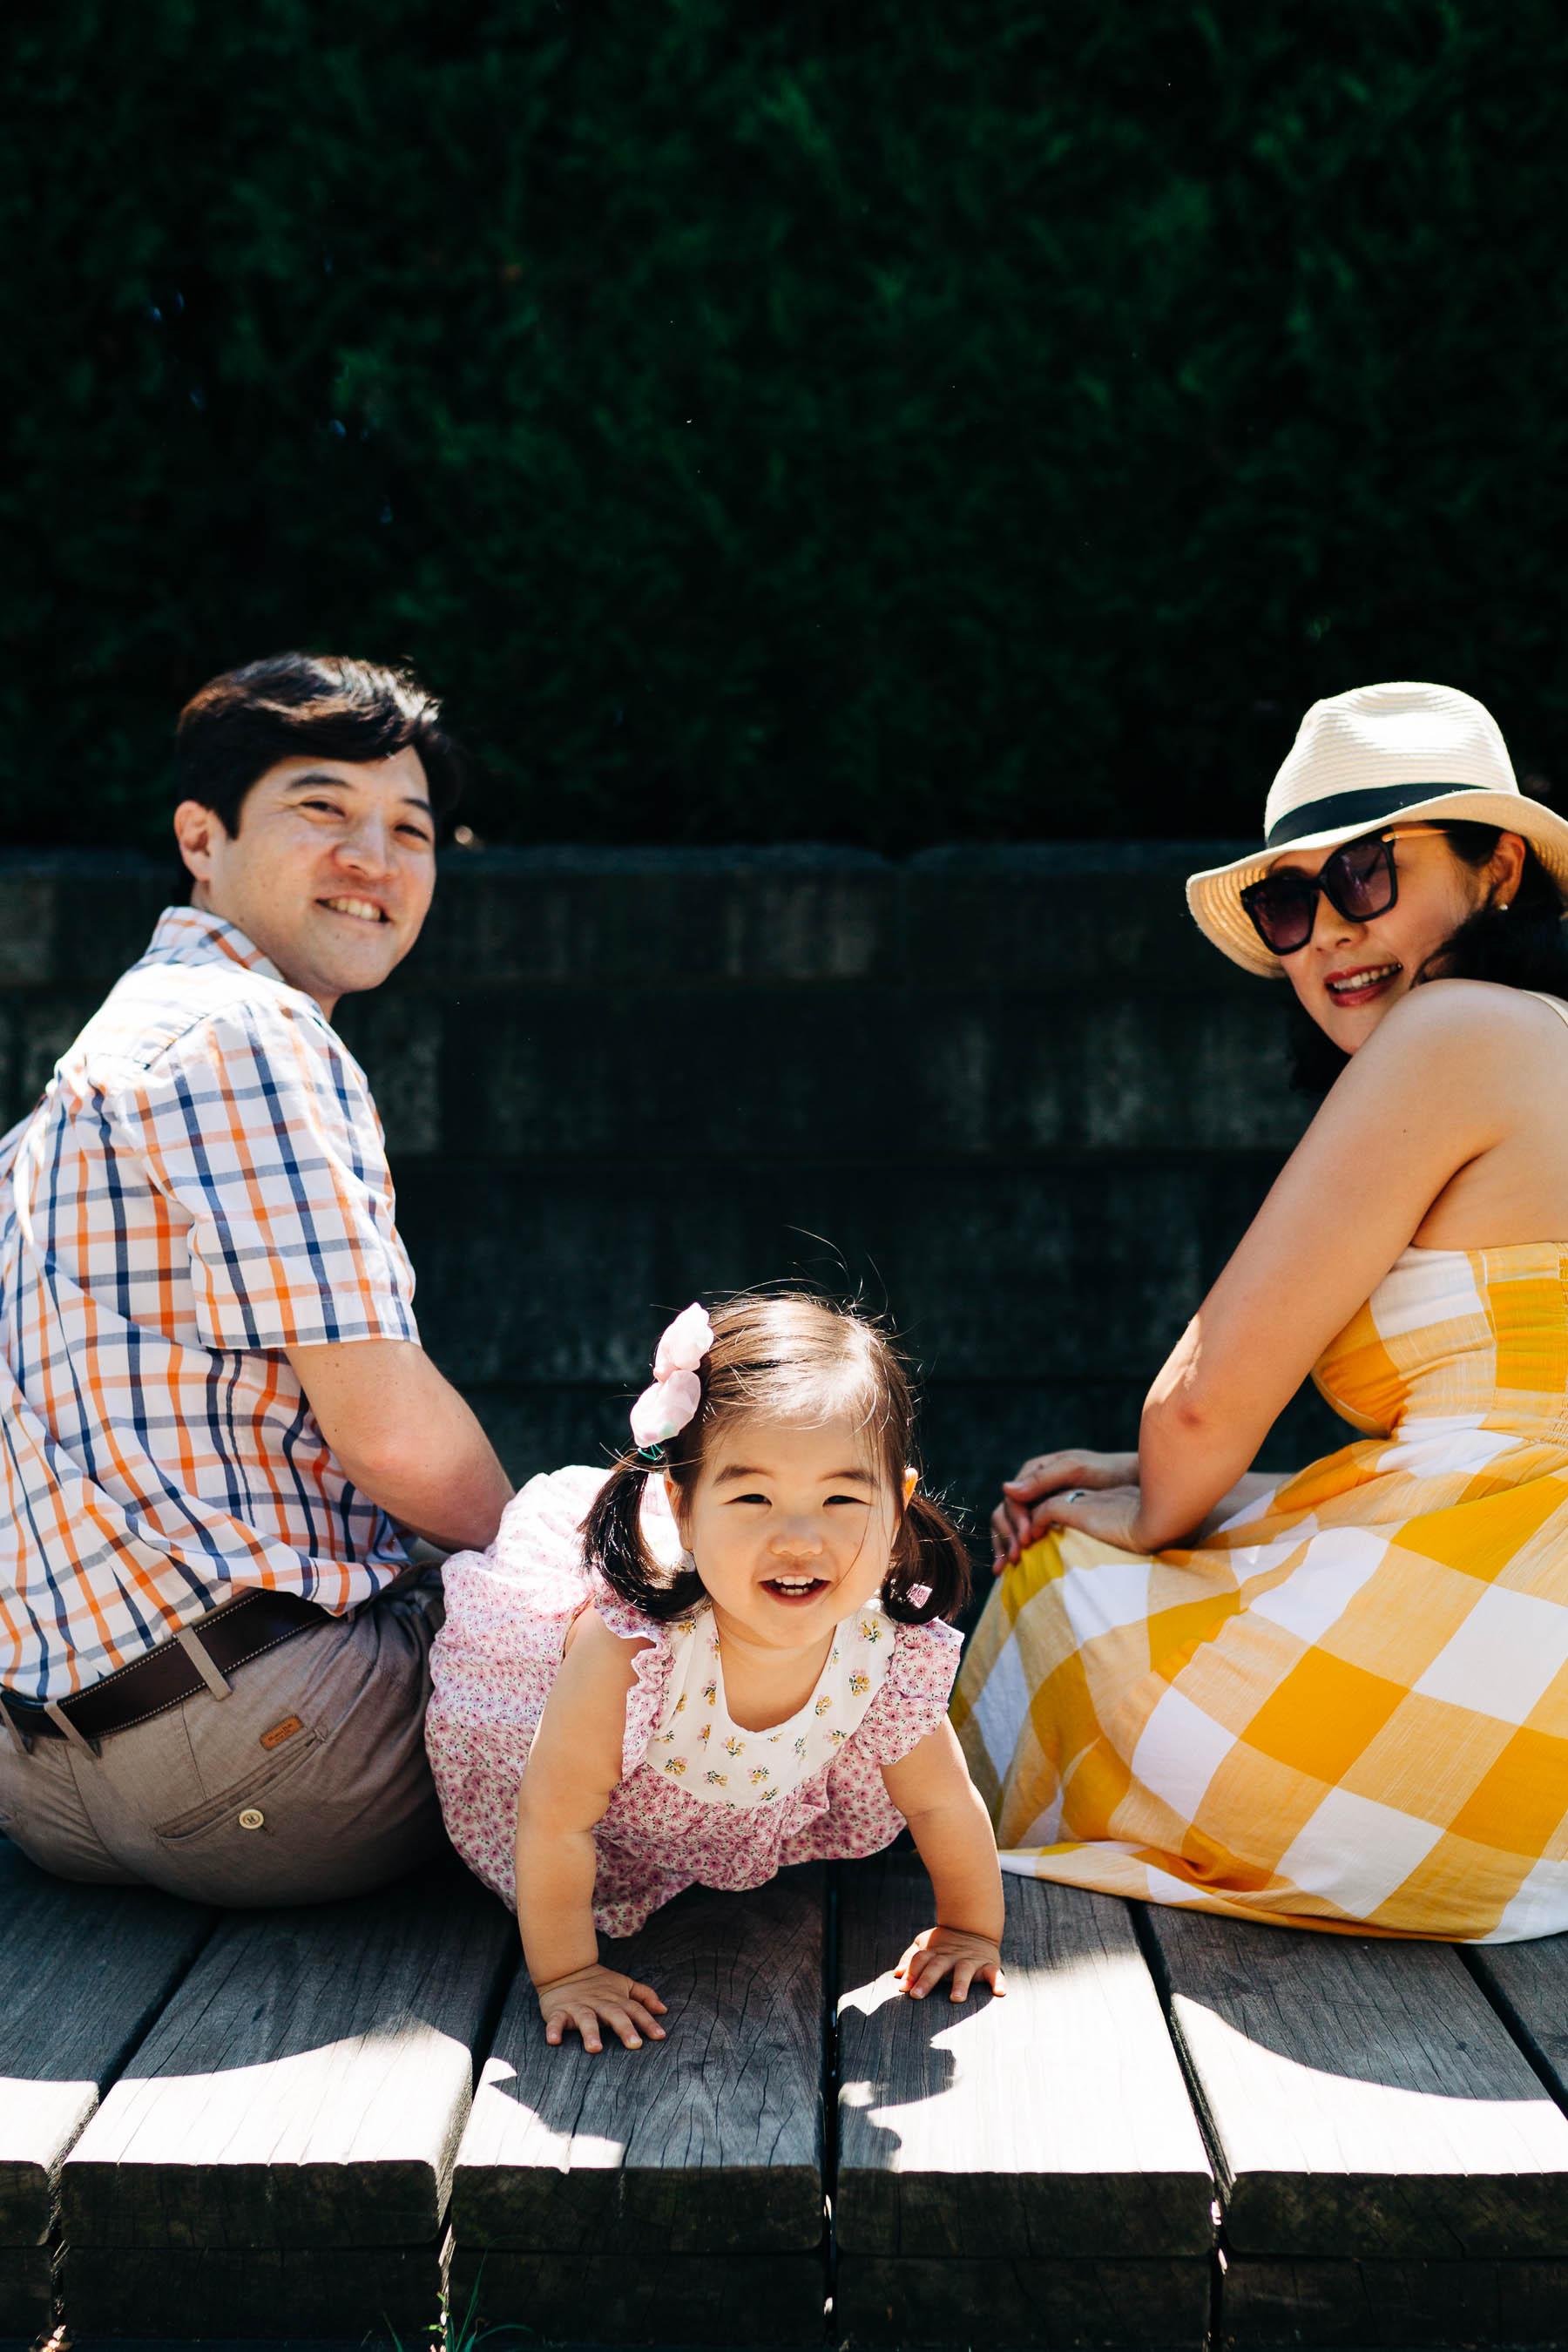 chicago-family-lifestyle-photographer-22.jpg